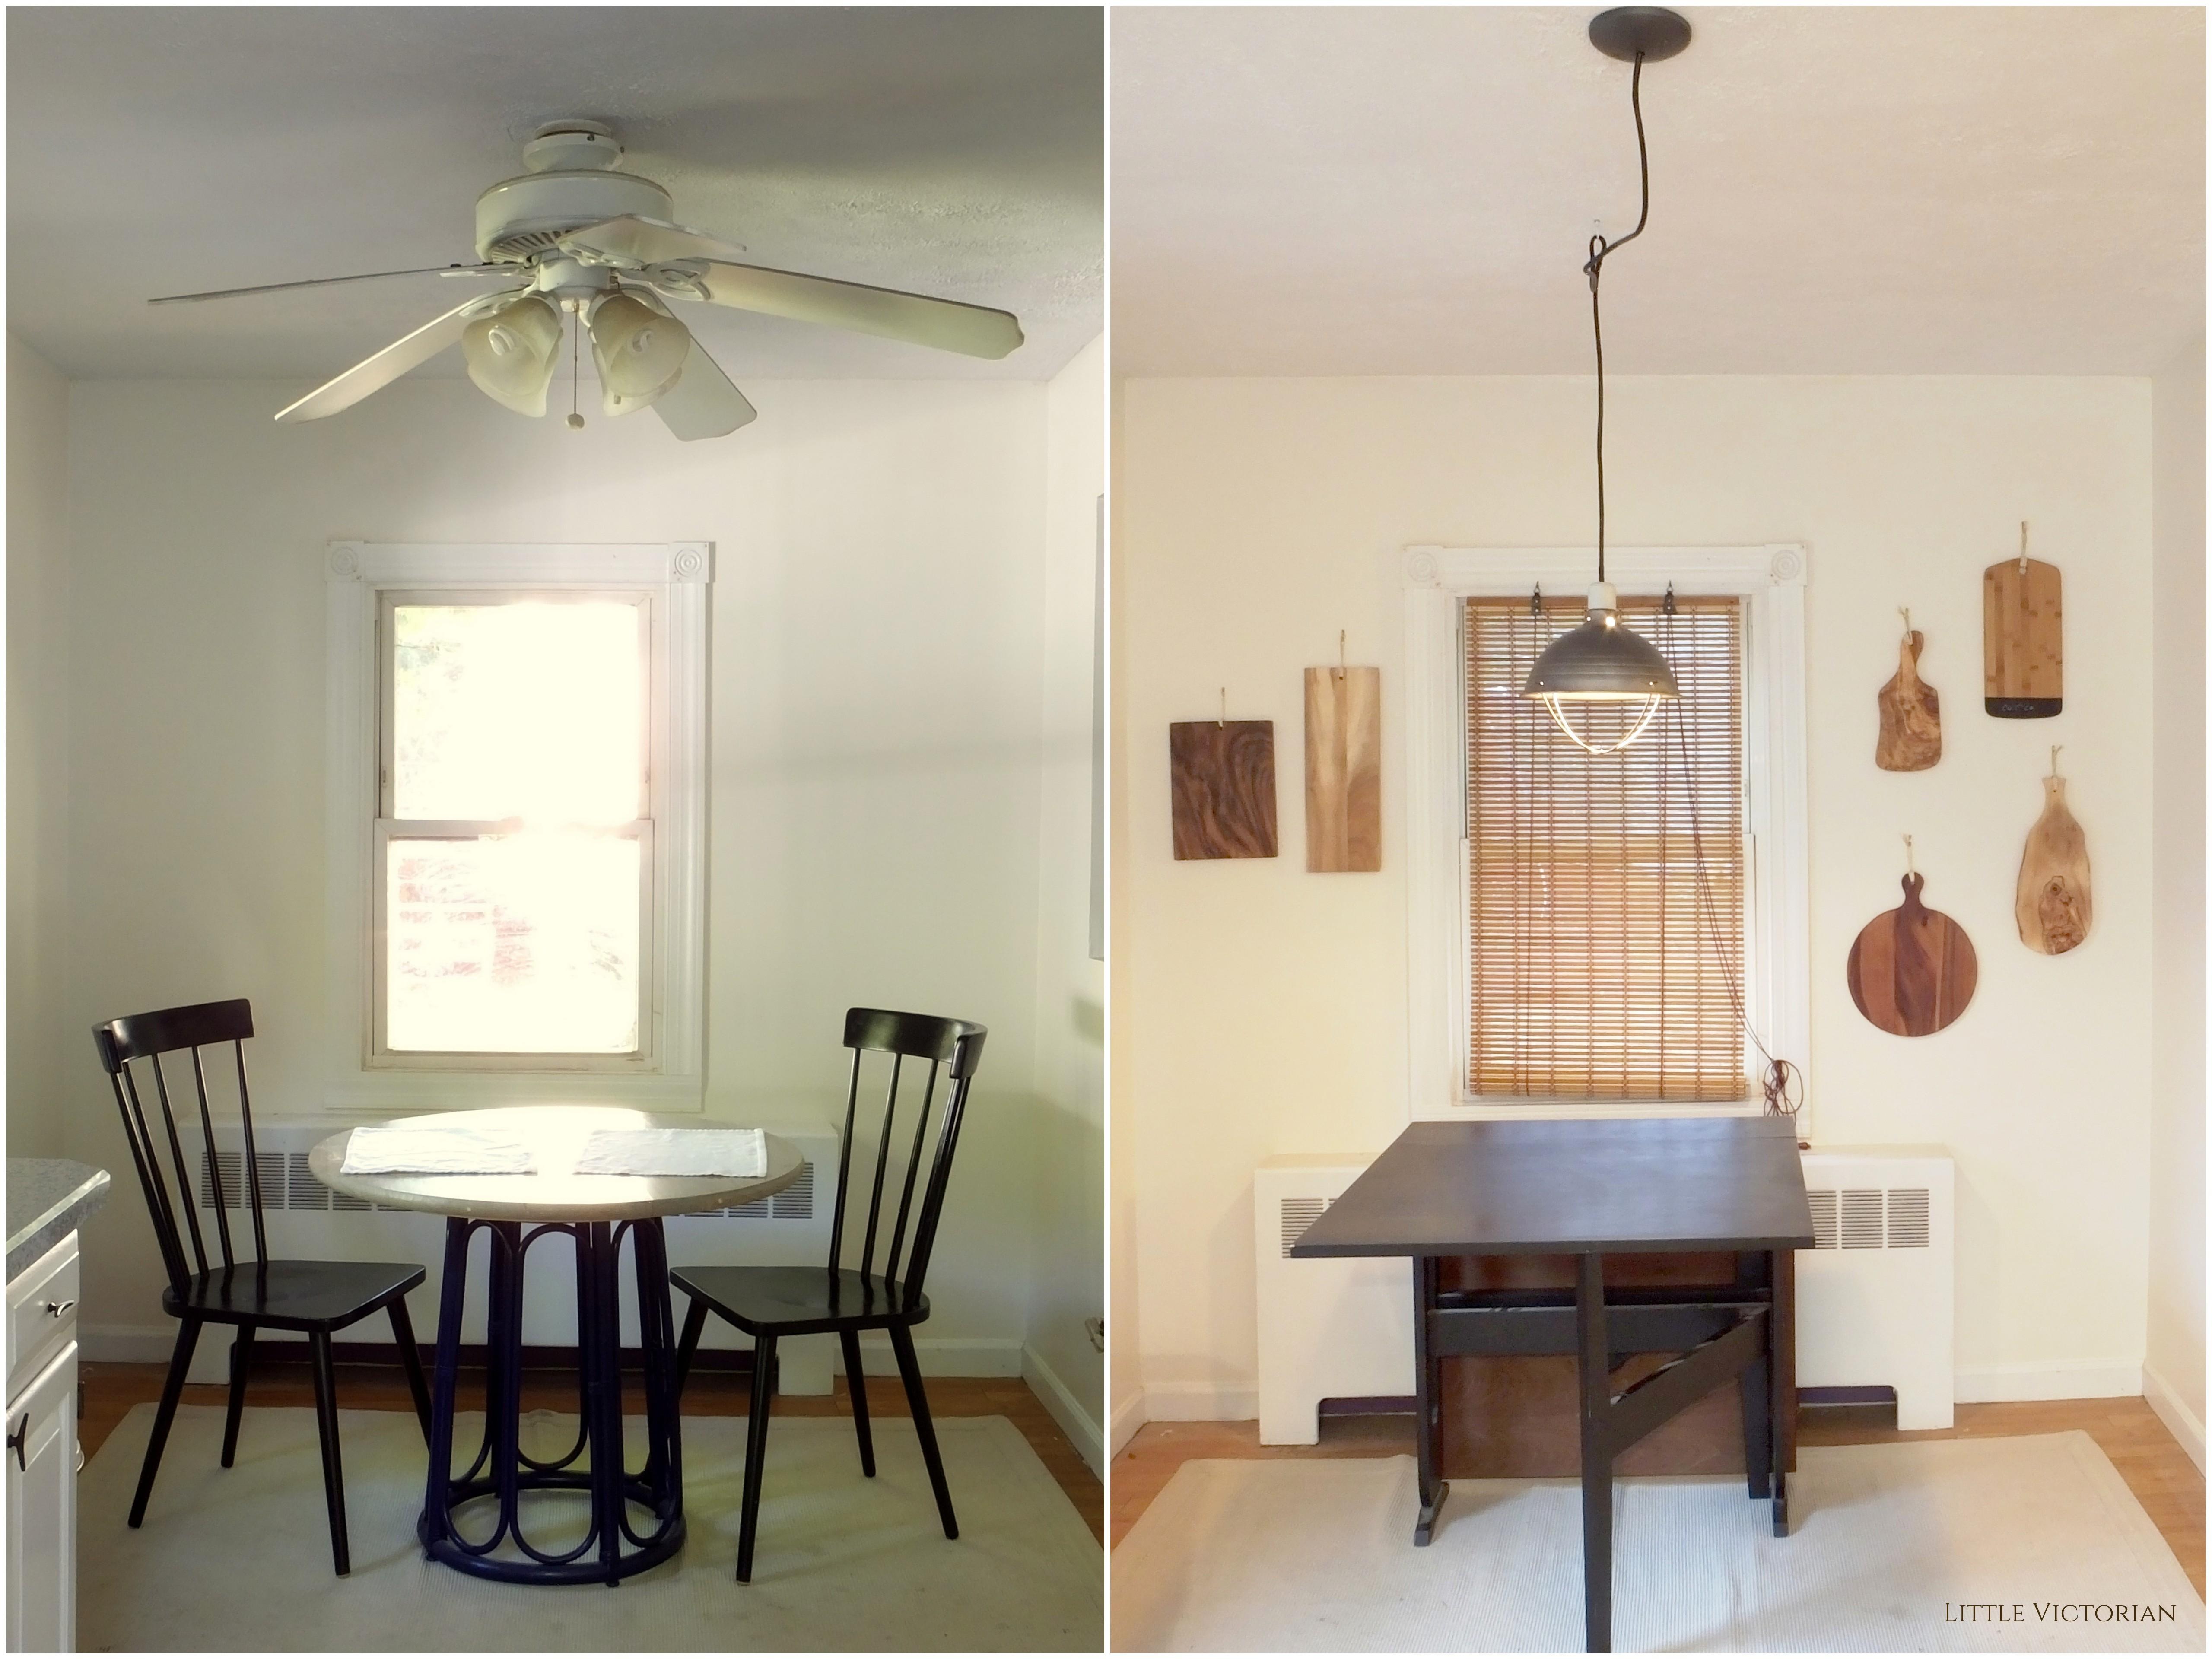 new kitchen lights kitchen fan light before ceiling fan after industrial light